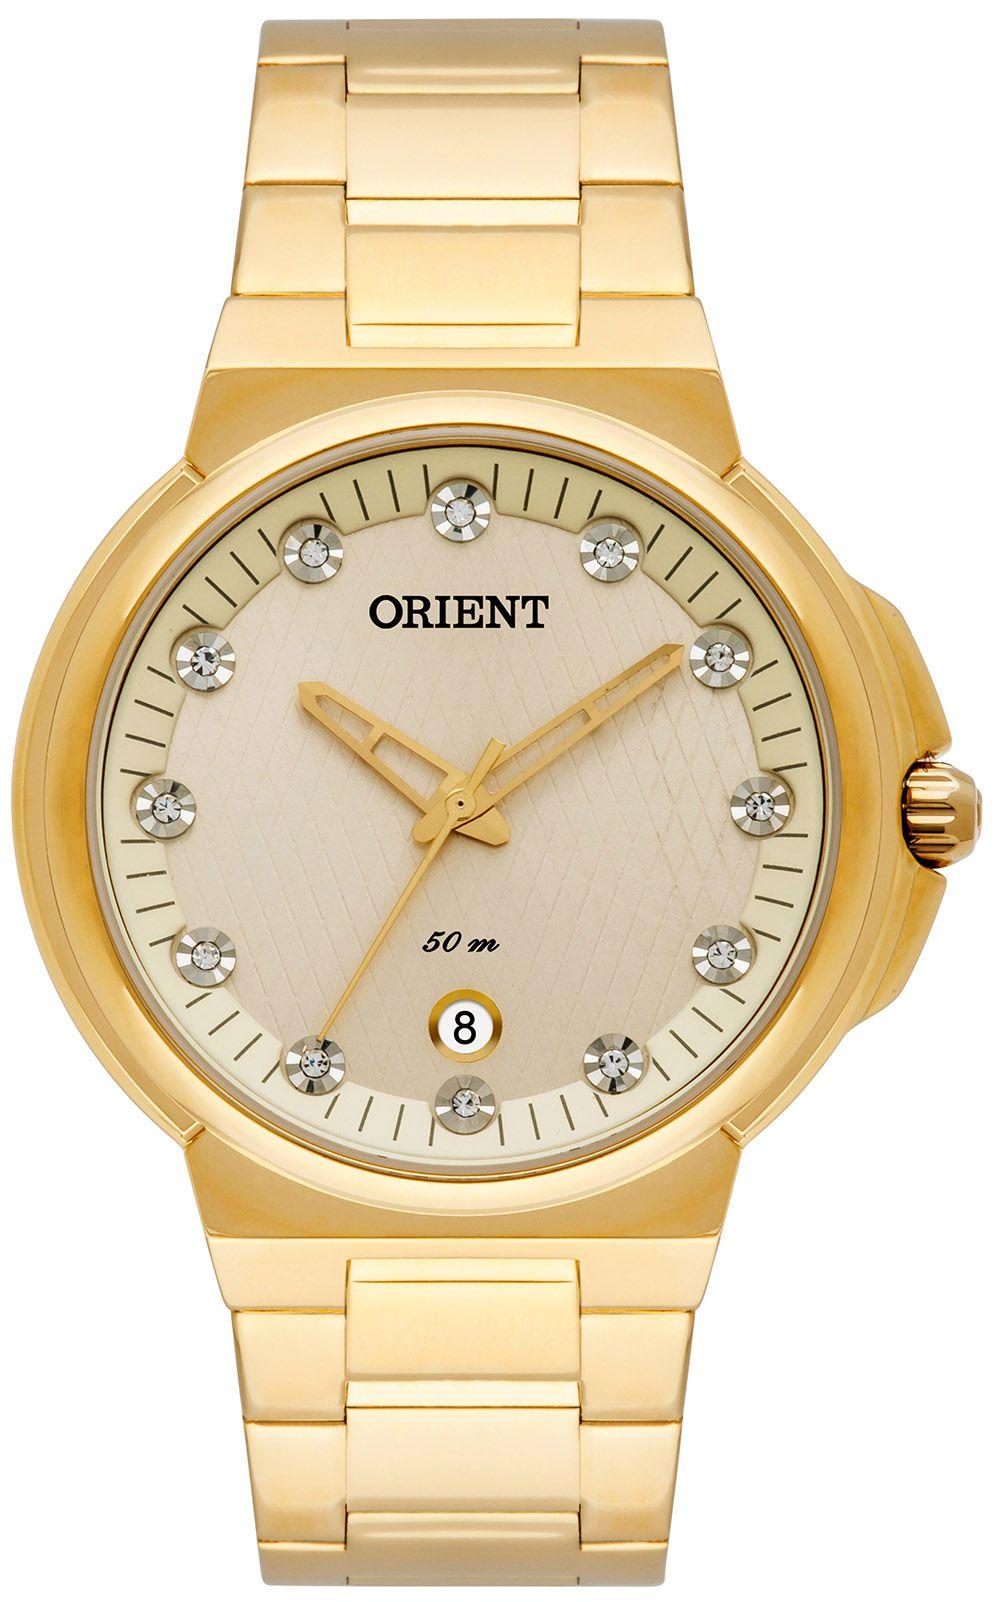 Relógio Feminino Orient FGSS1129-C1KX Dourado